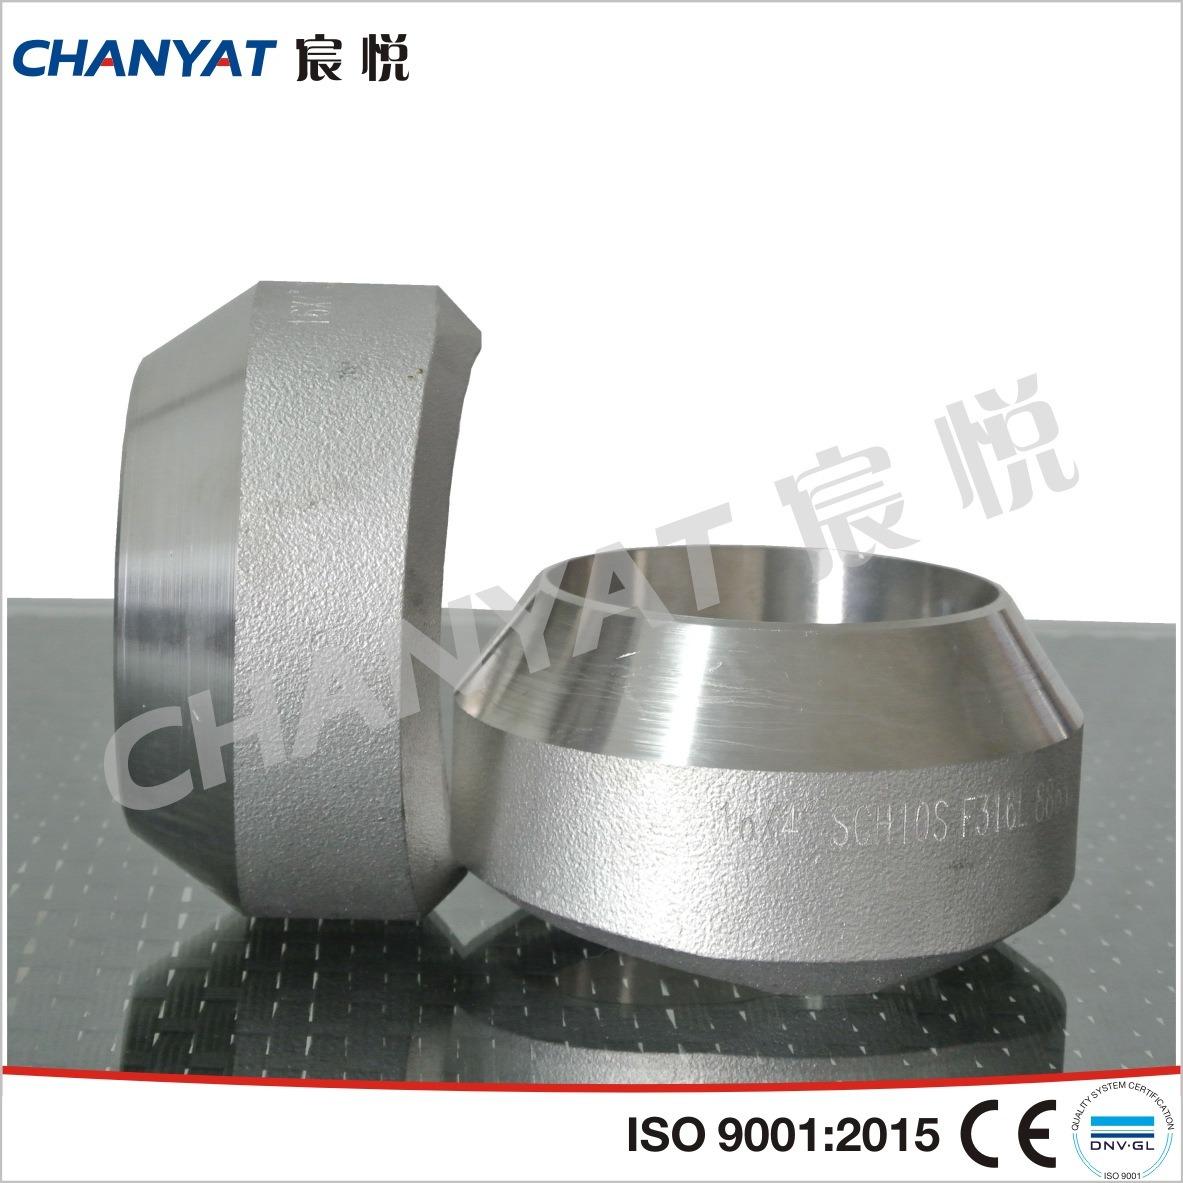 Carbon Steel Forged Sockolet 1.7335, 13cmo44, 13crmo4-5